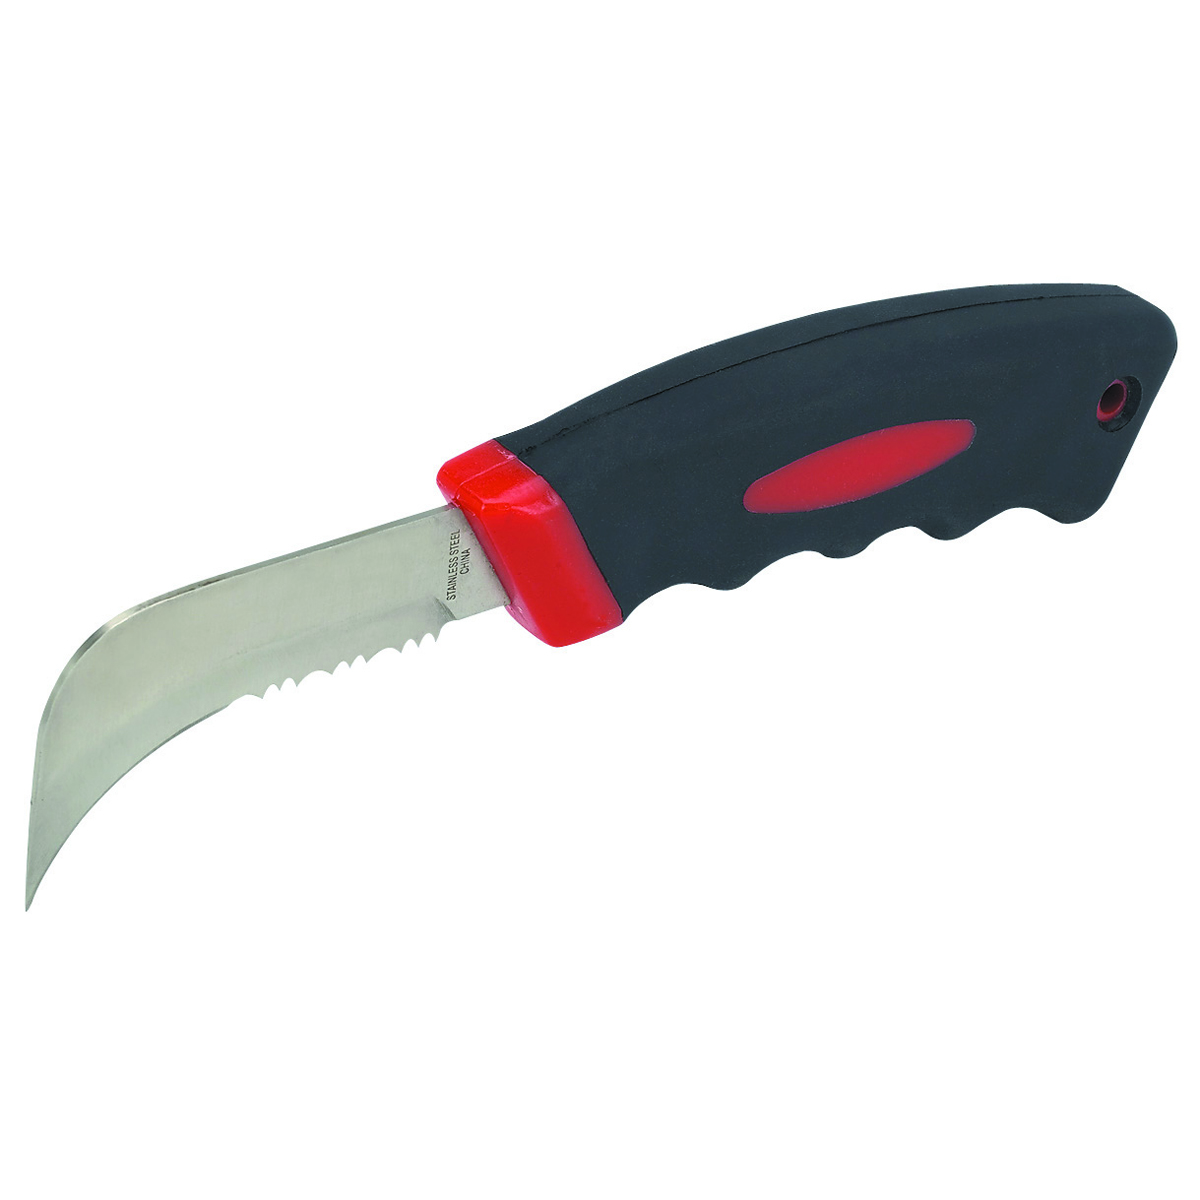 8 Quot Linoleum Knife